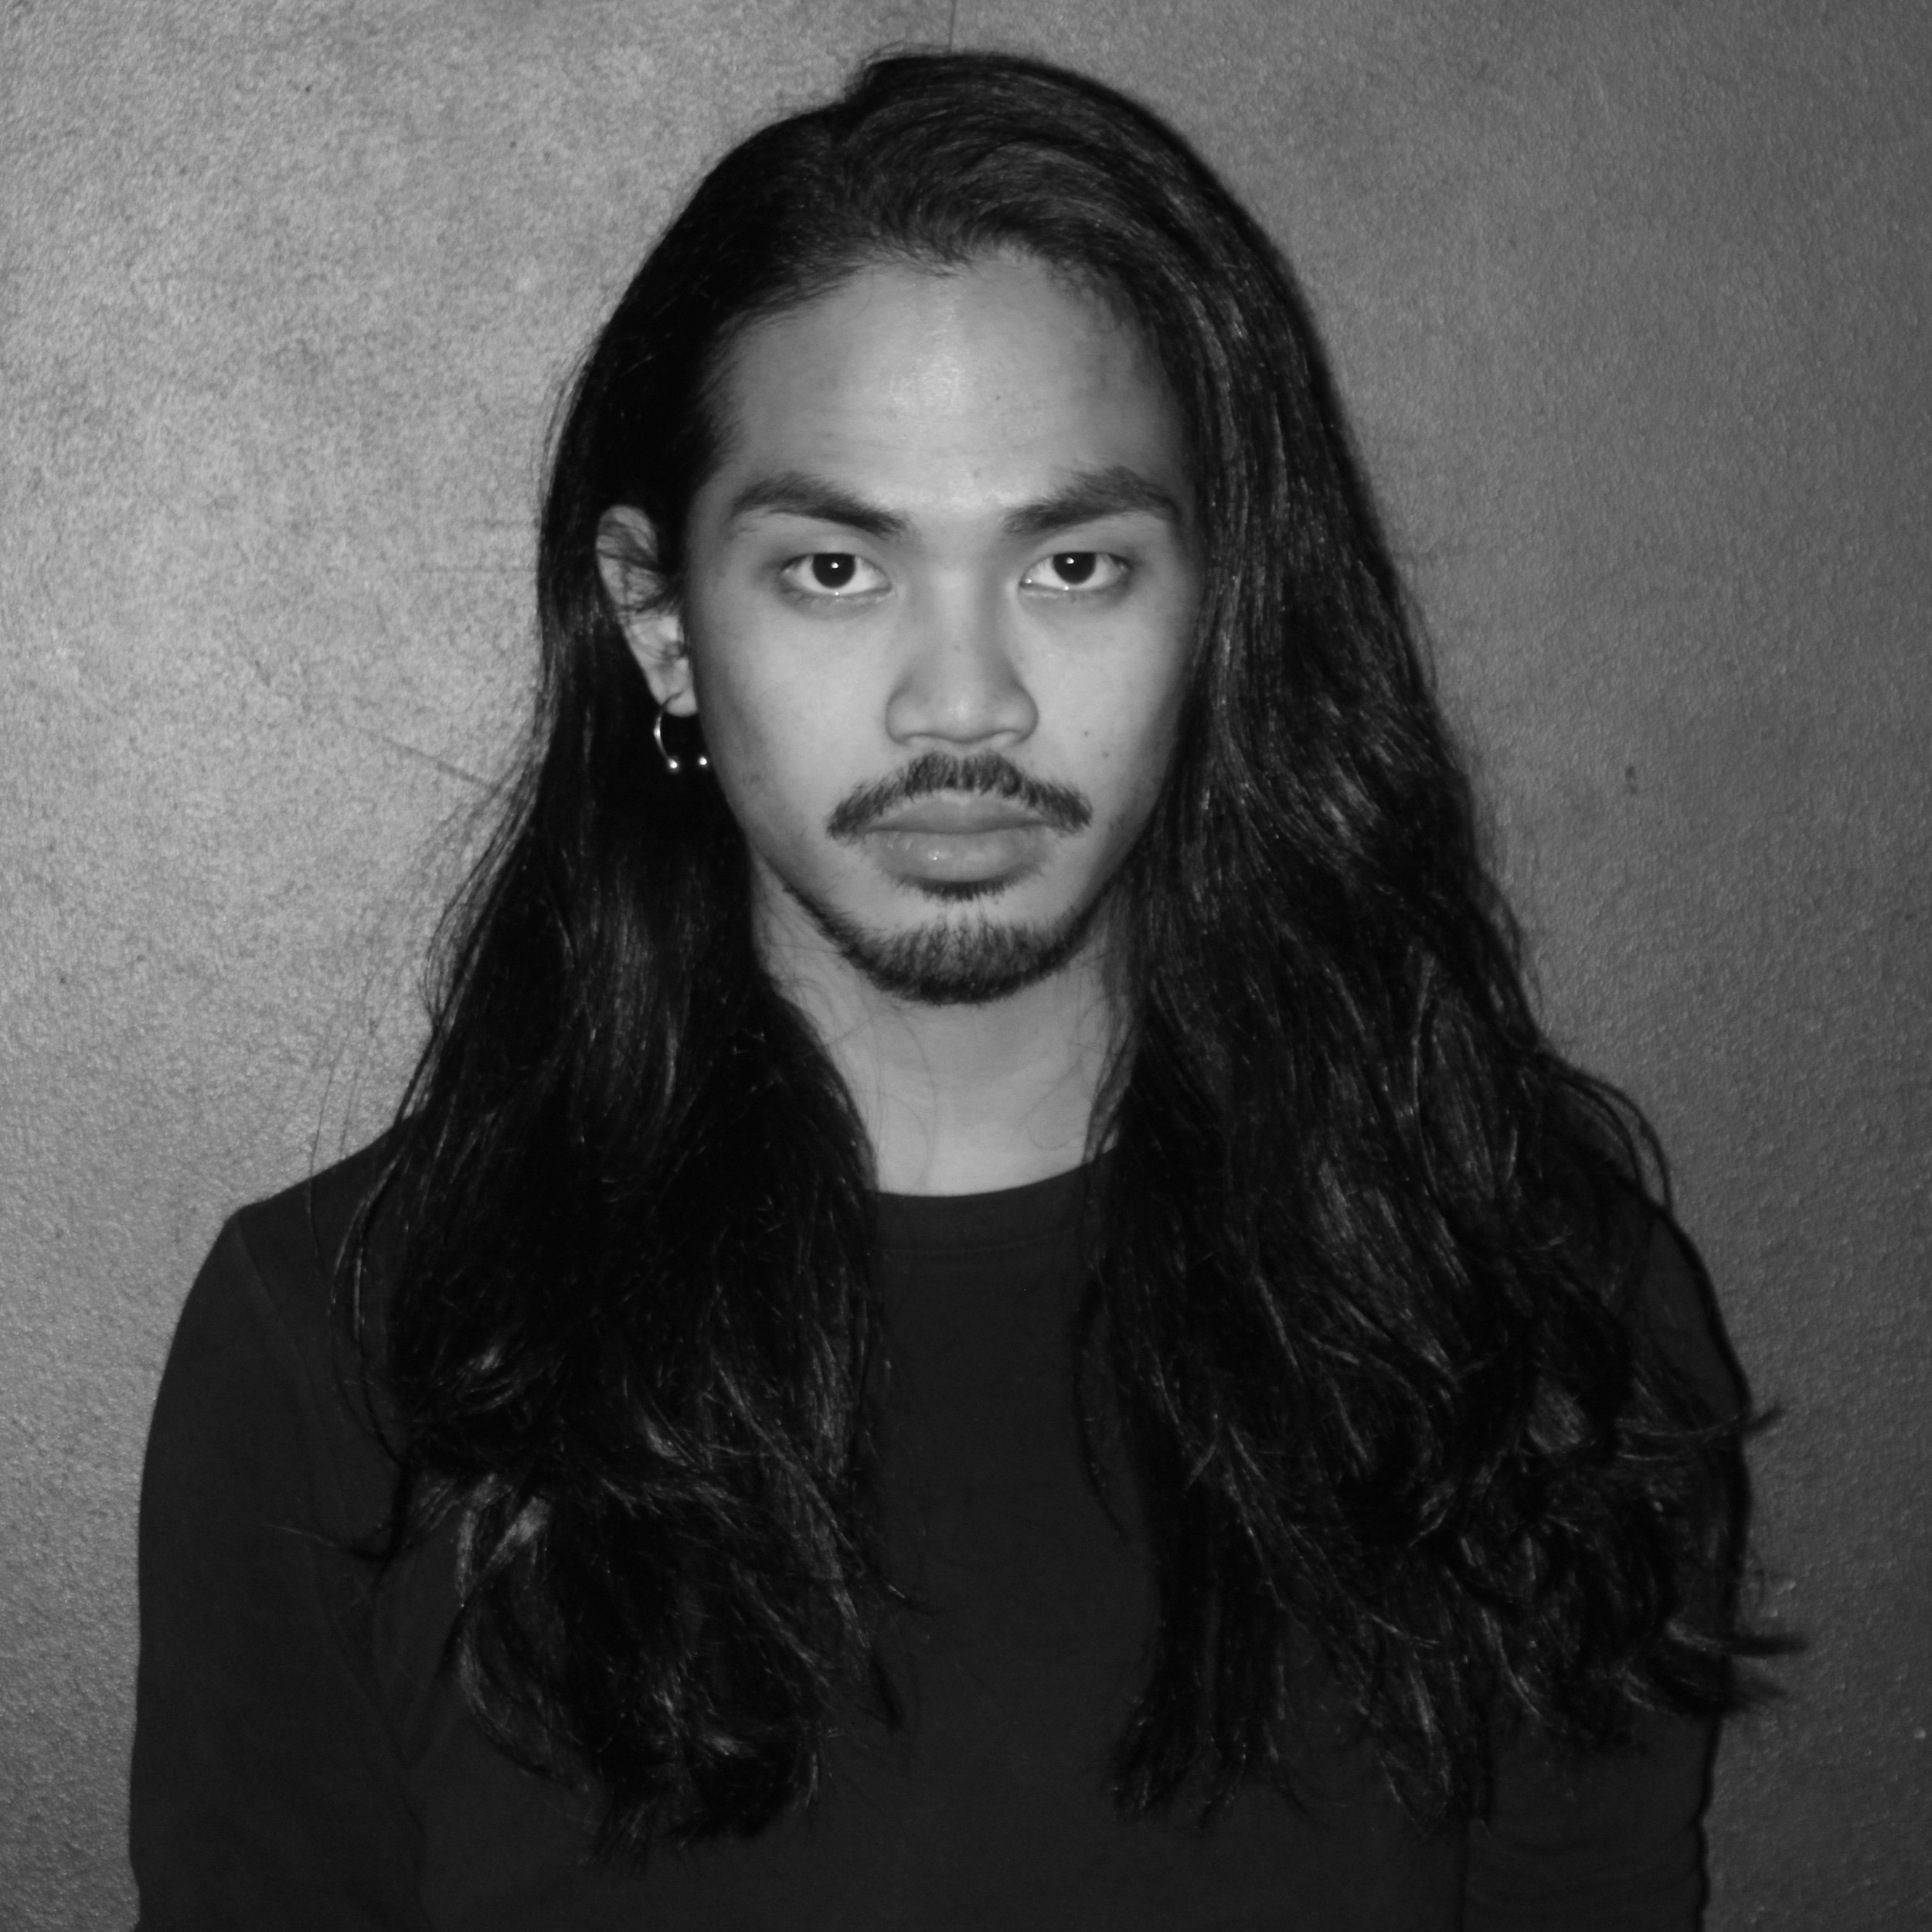 Joshua Serafin (Dancer/Performer, Philippines/ Belgium)